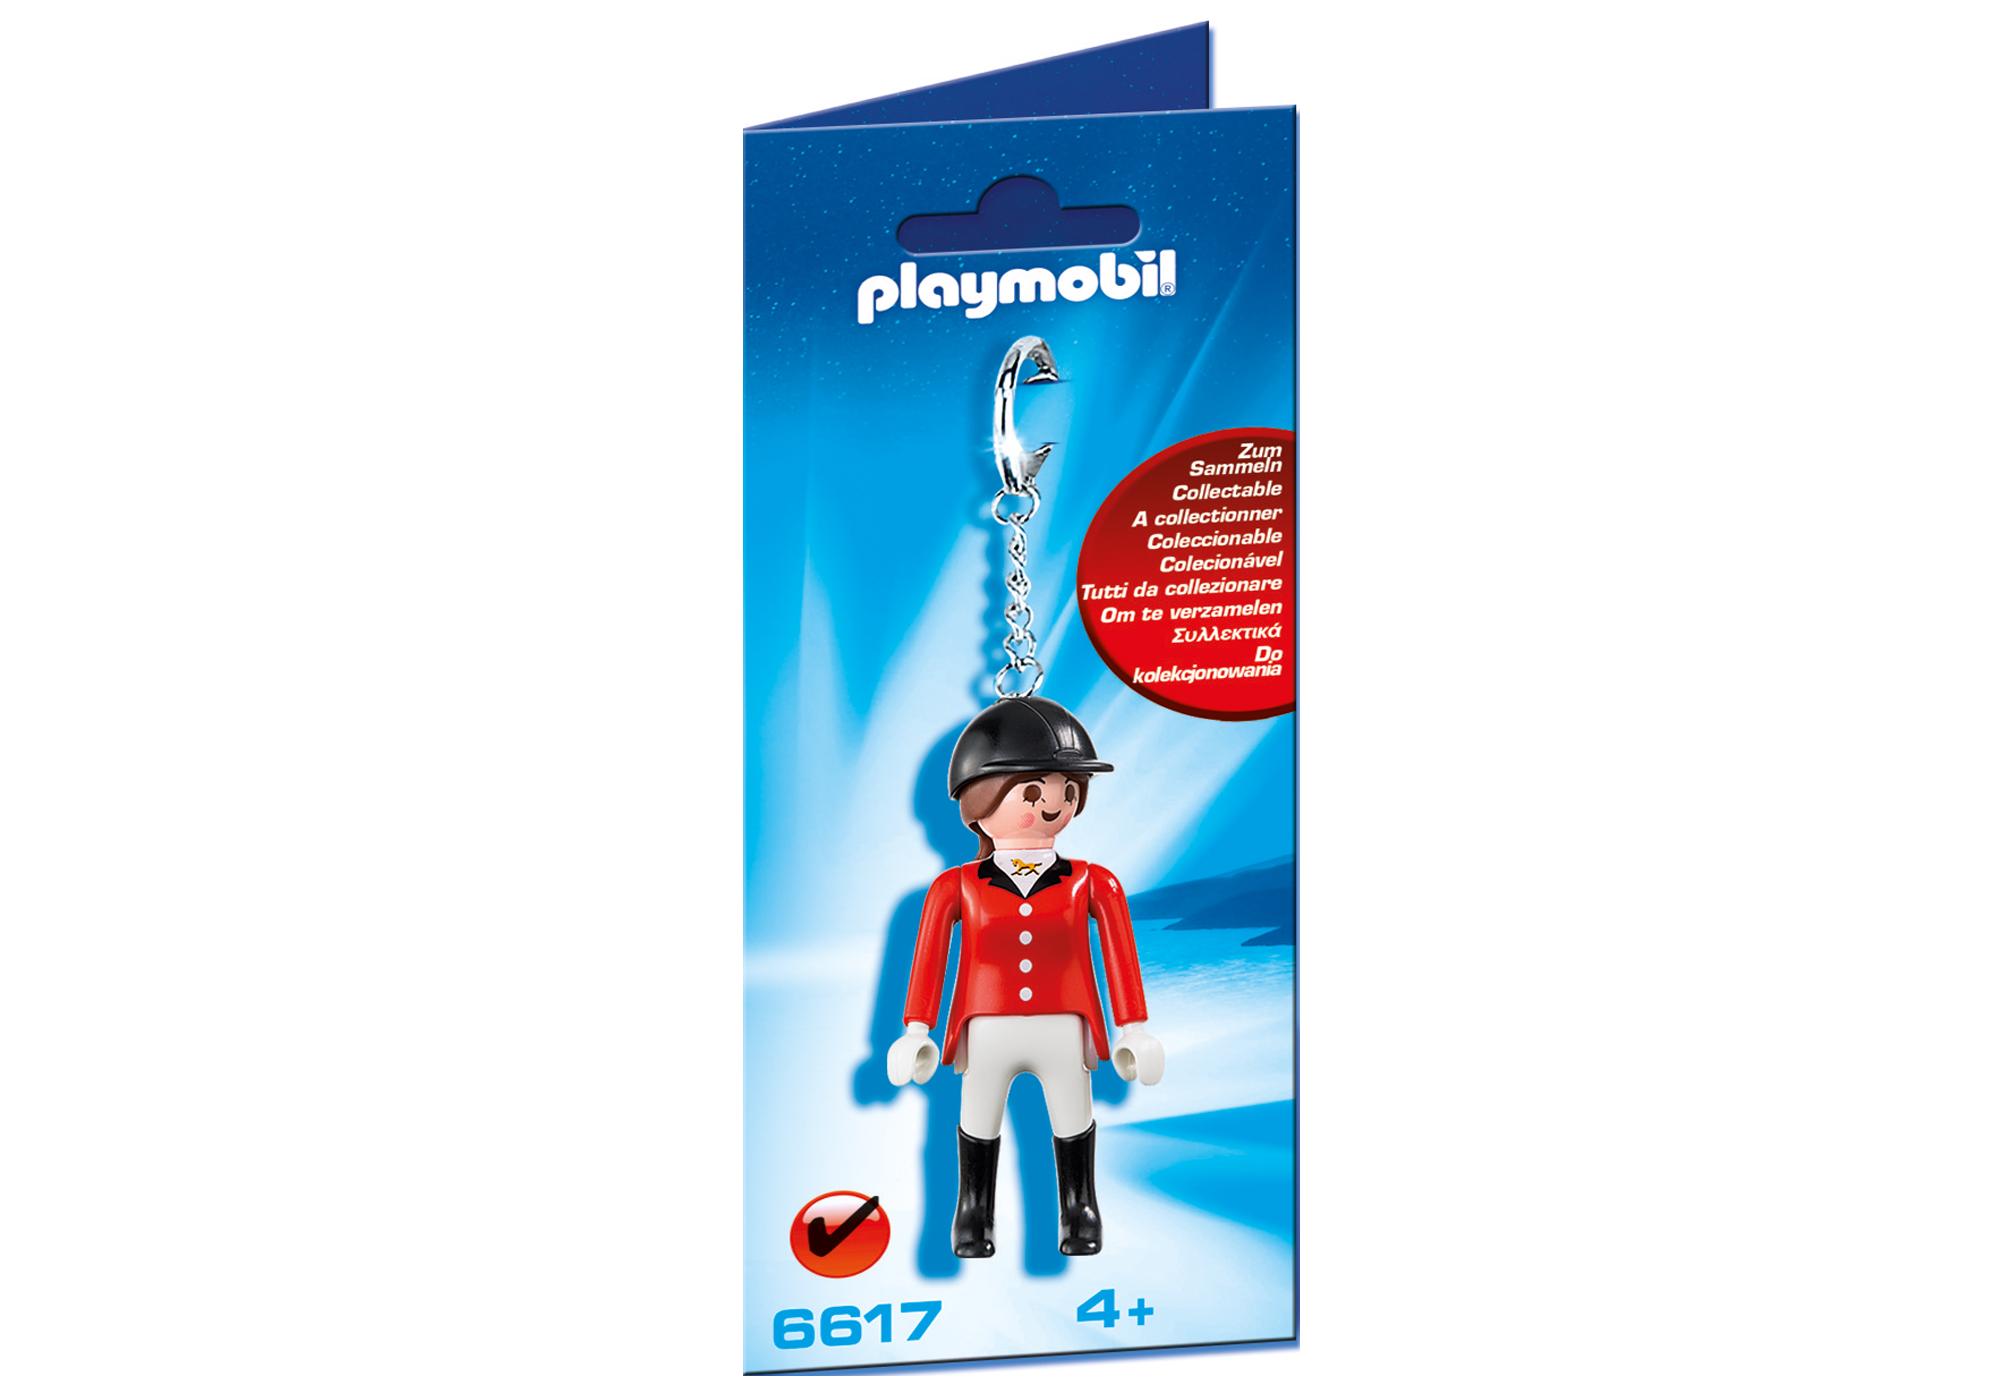 http://media.playmobil.com/i/playmobil/6617_product_box_front